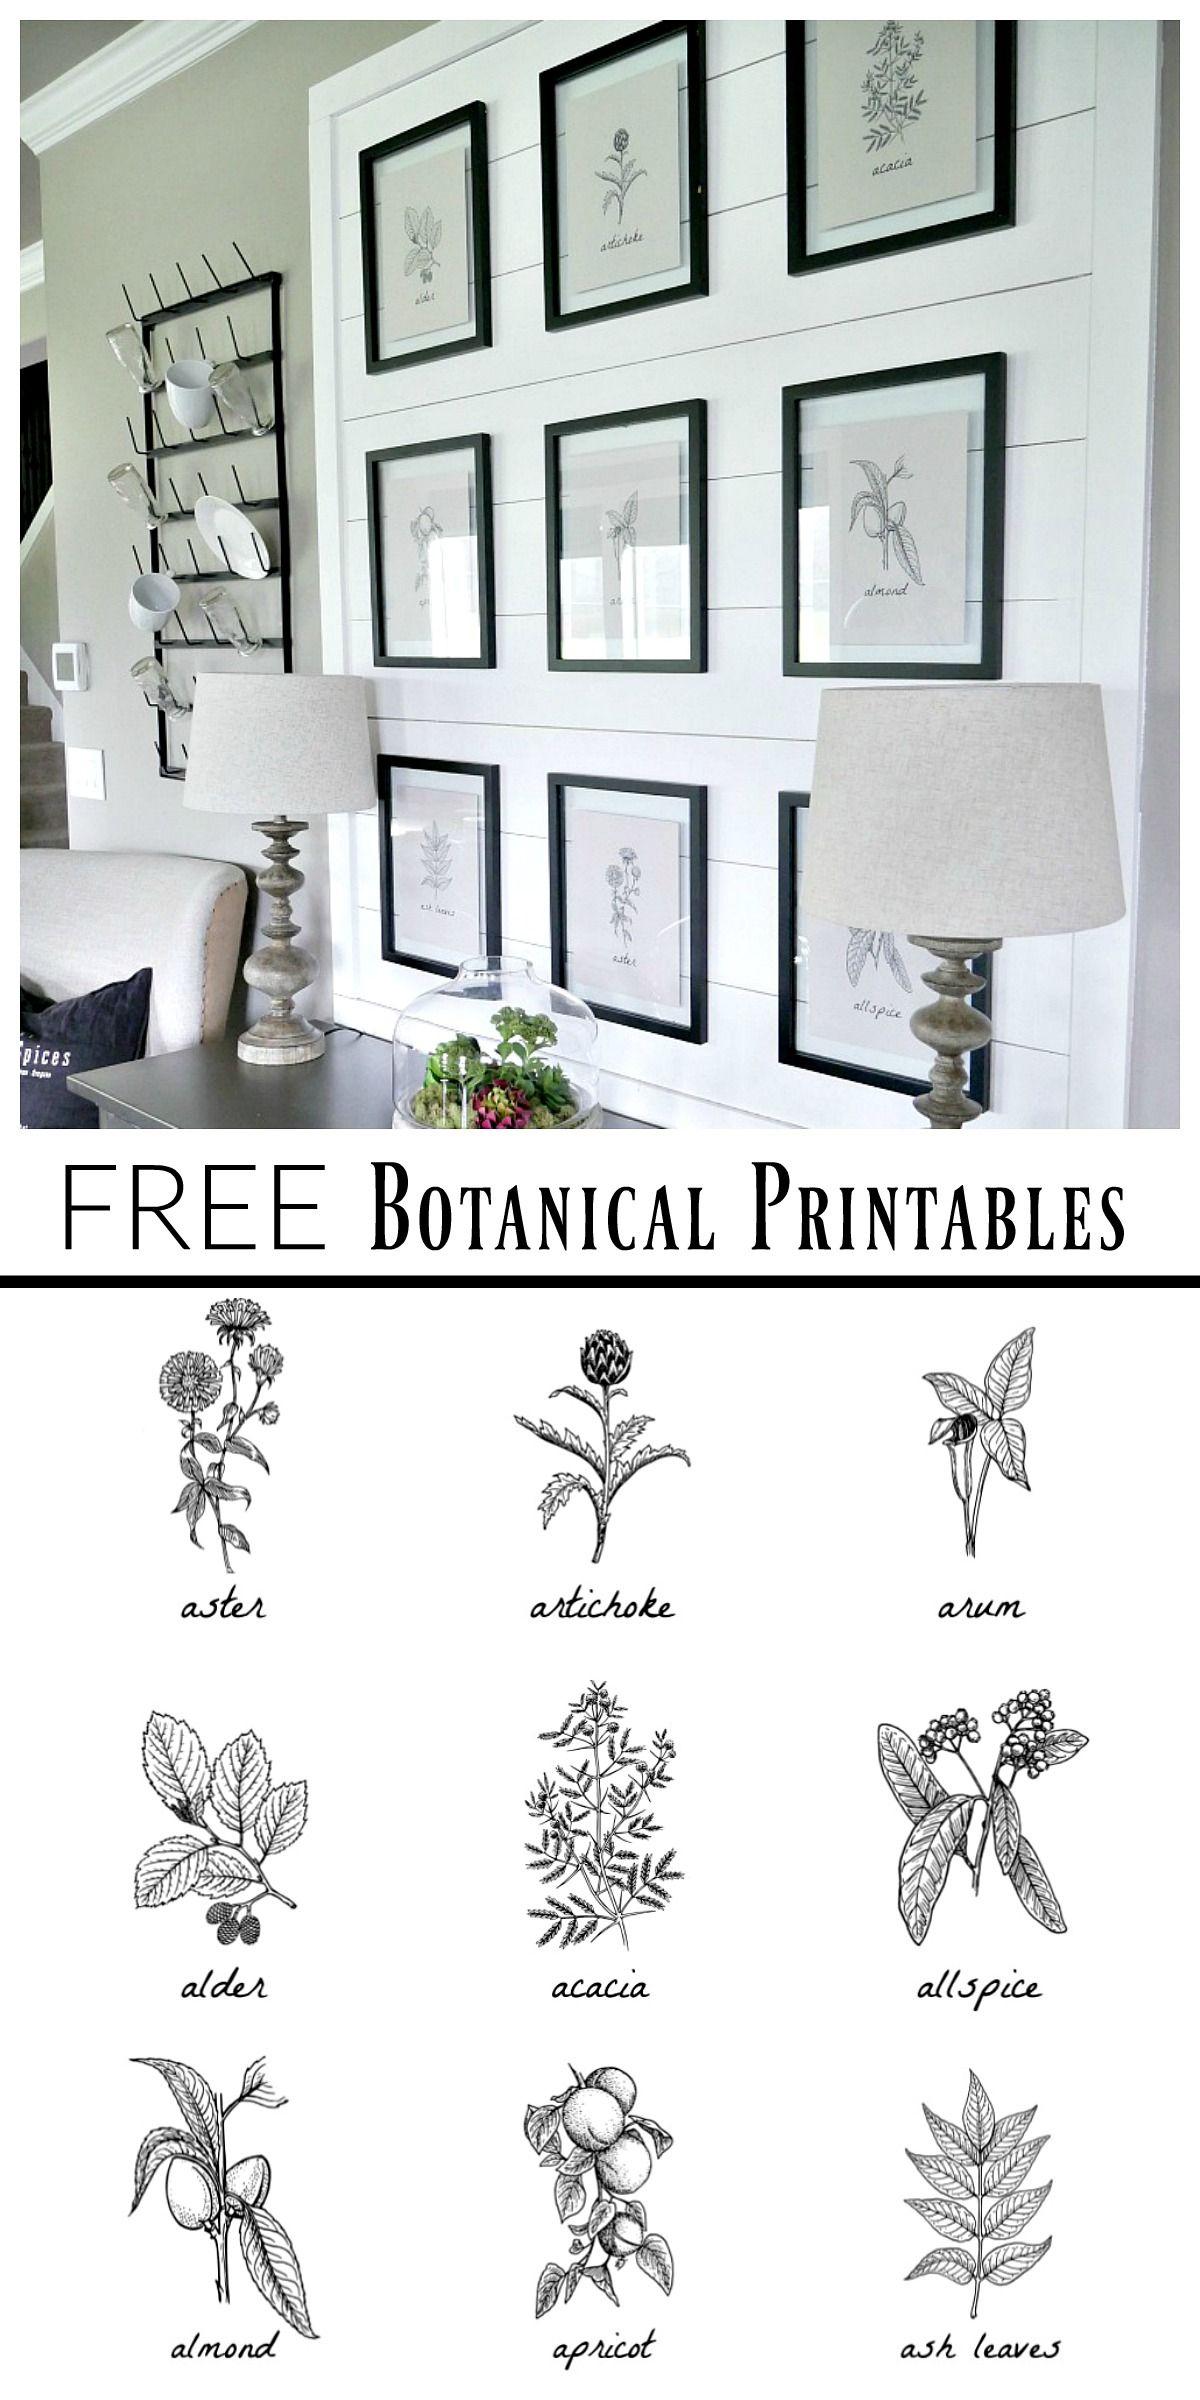 Free Botanical Prints | Bloggers' Best Diy Ideas | Dining Room - Free Black And White Printable Art